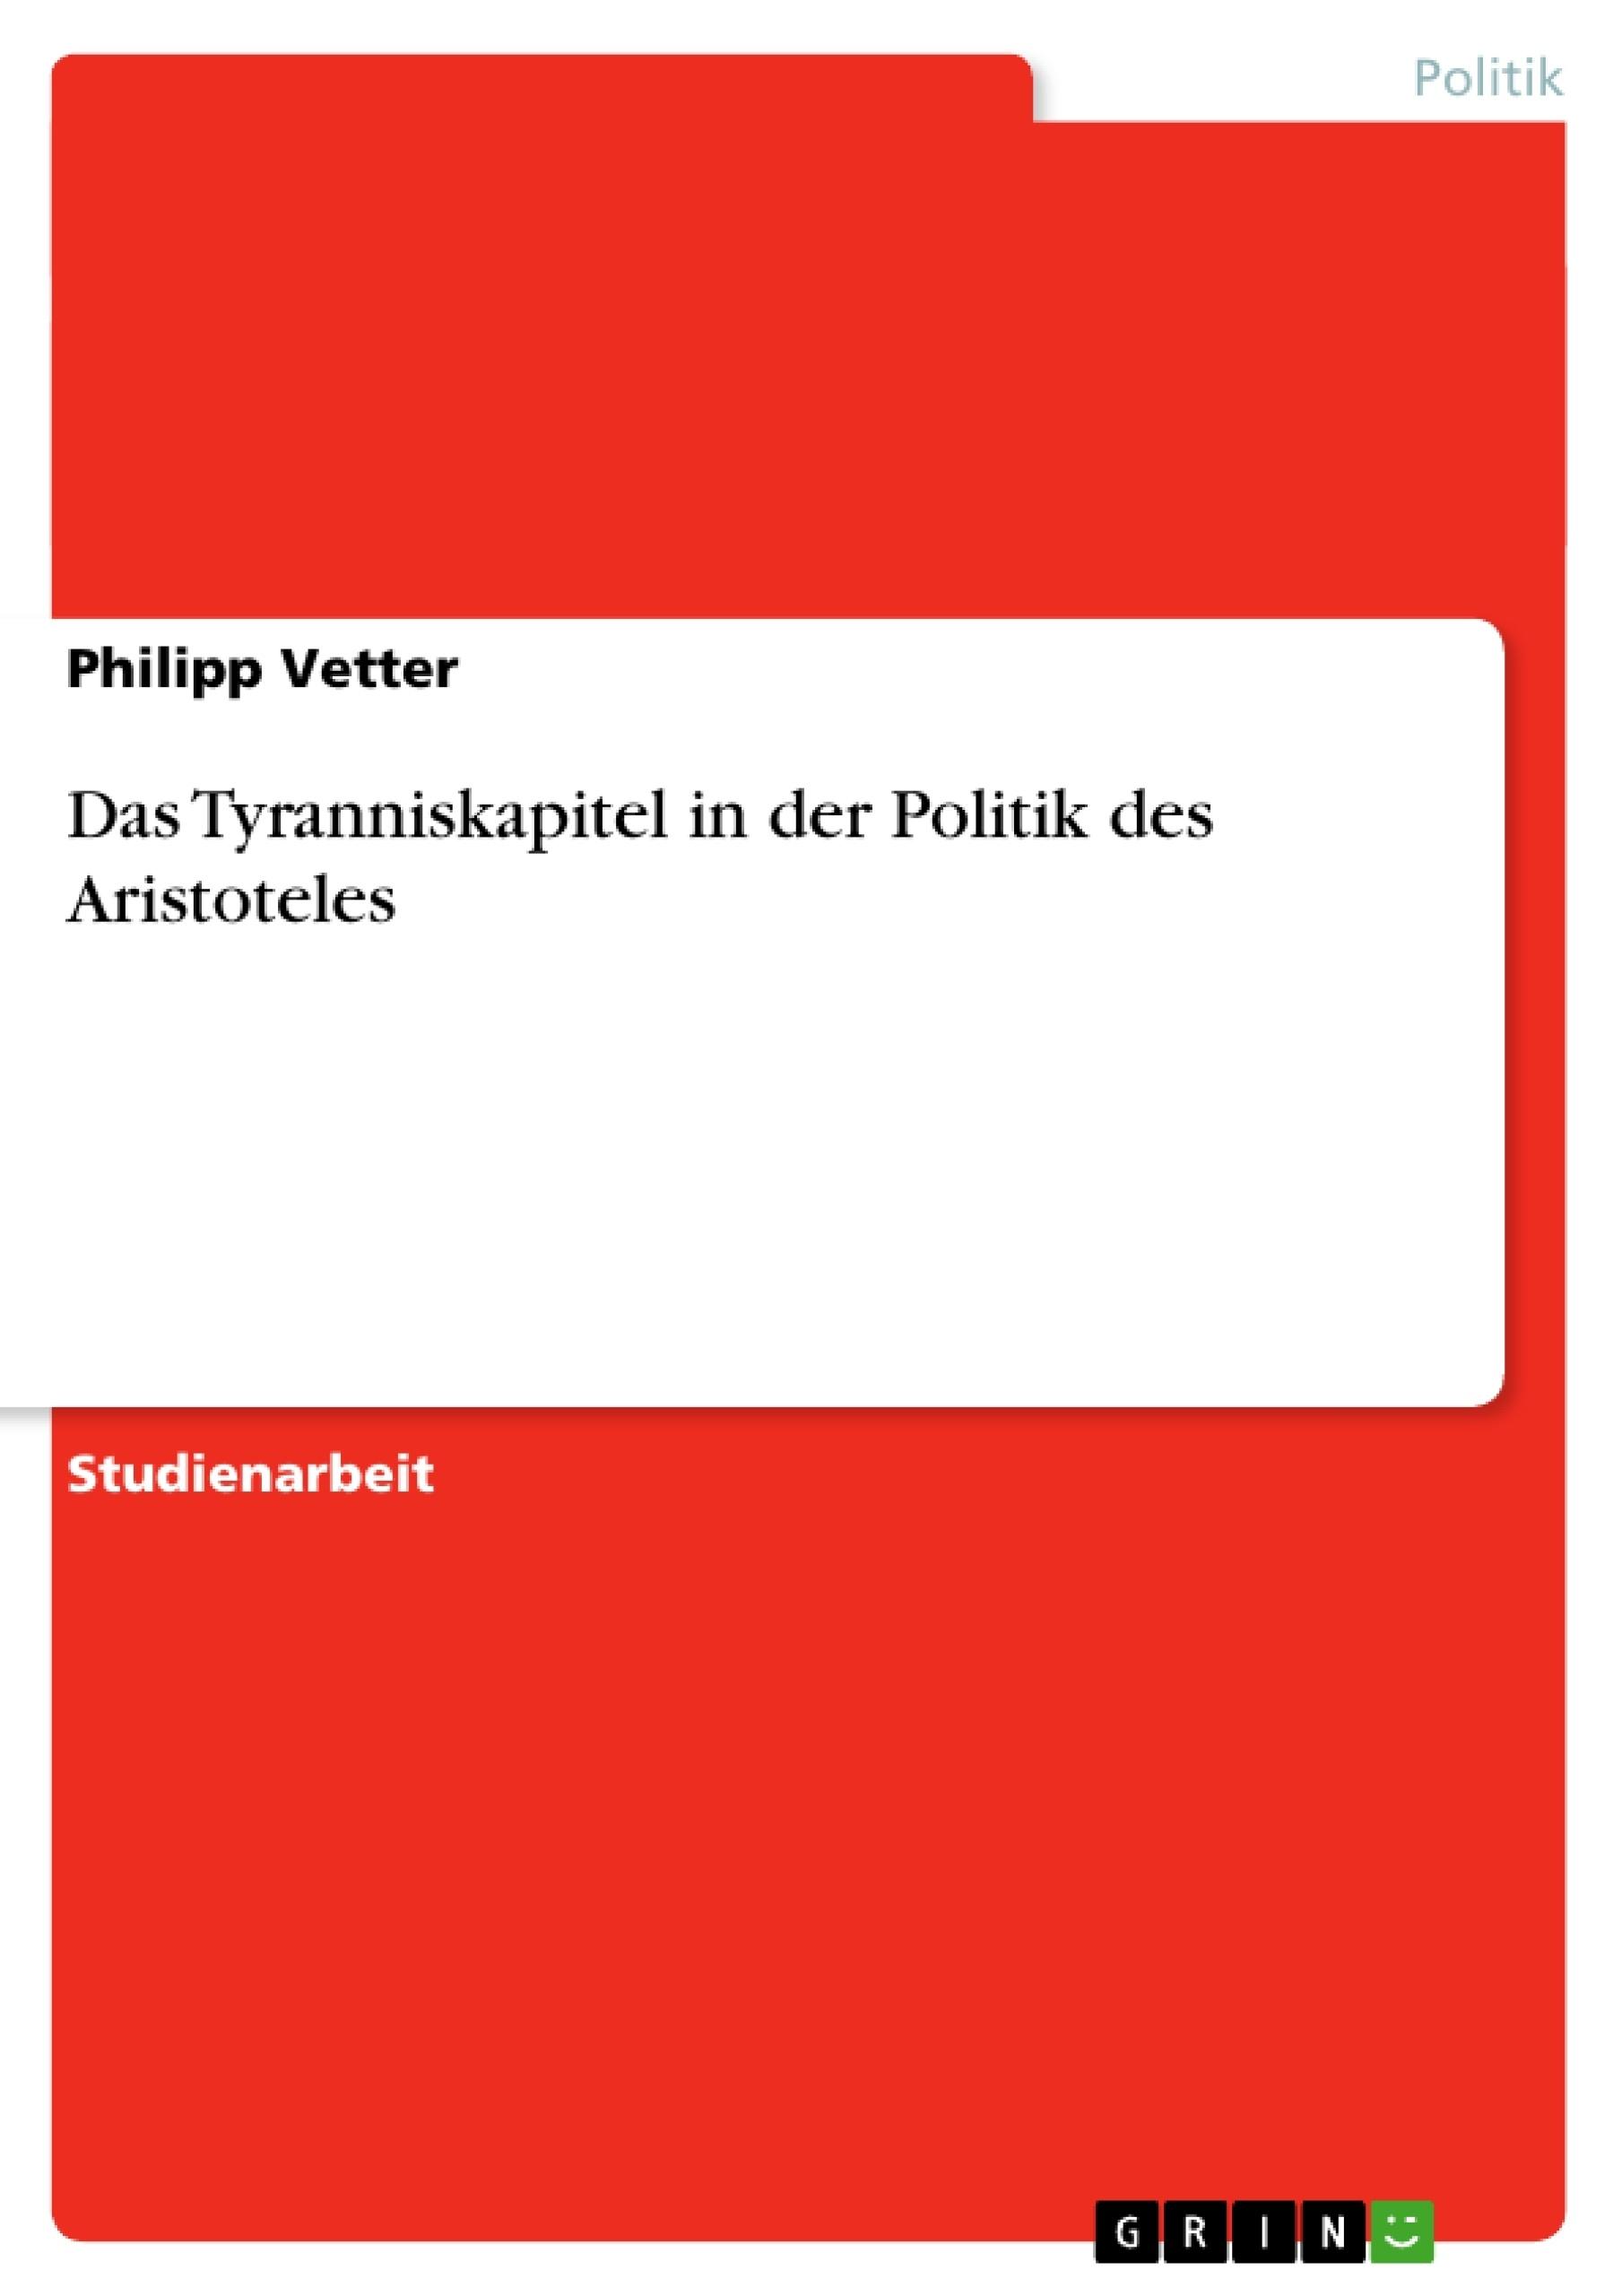 Titel: Das Tyranniskapitel in der  Politik  des Aristoteles